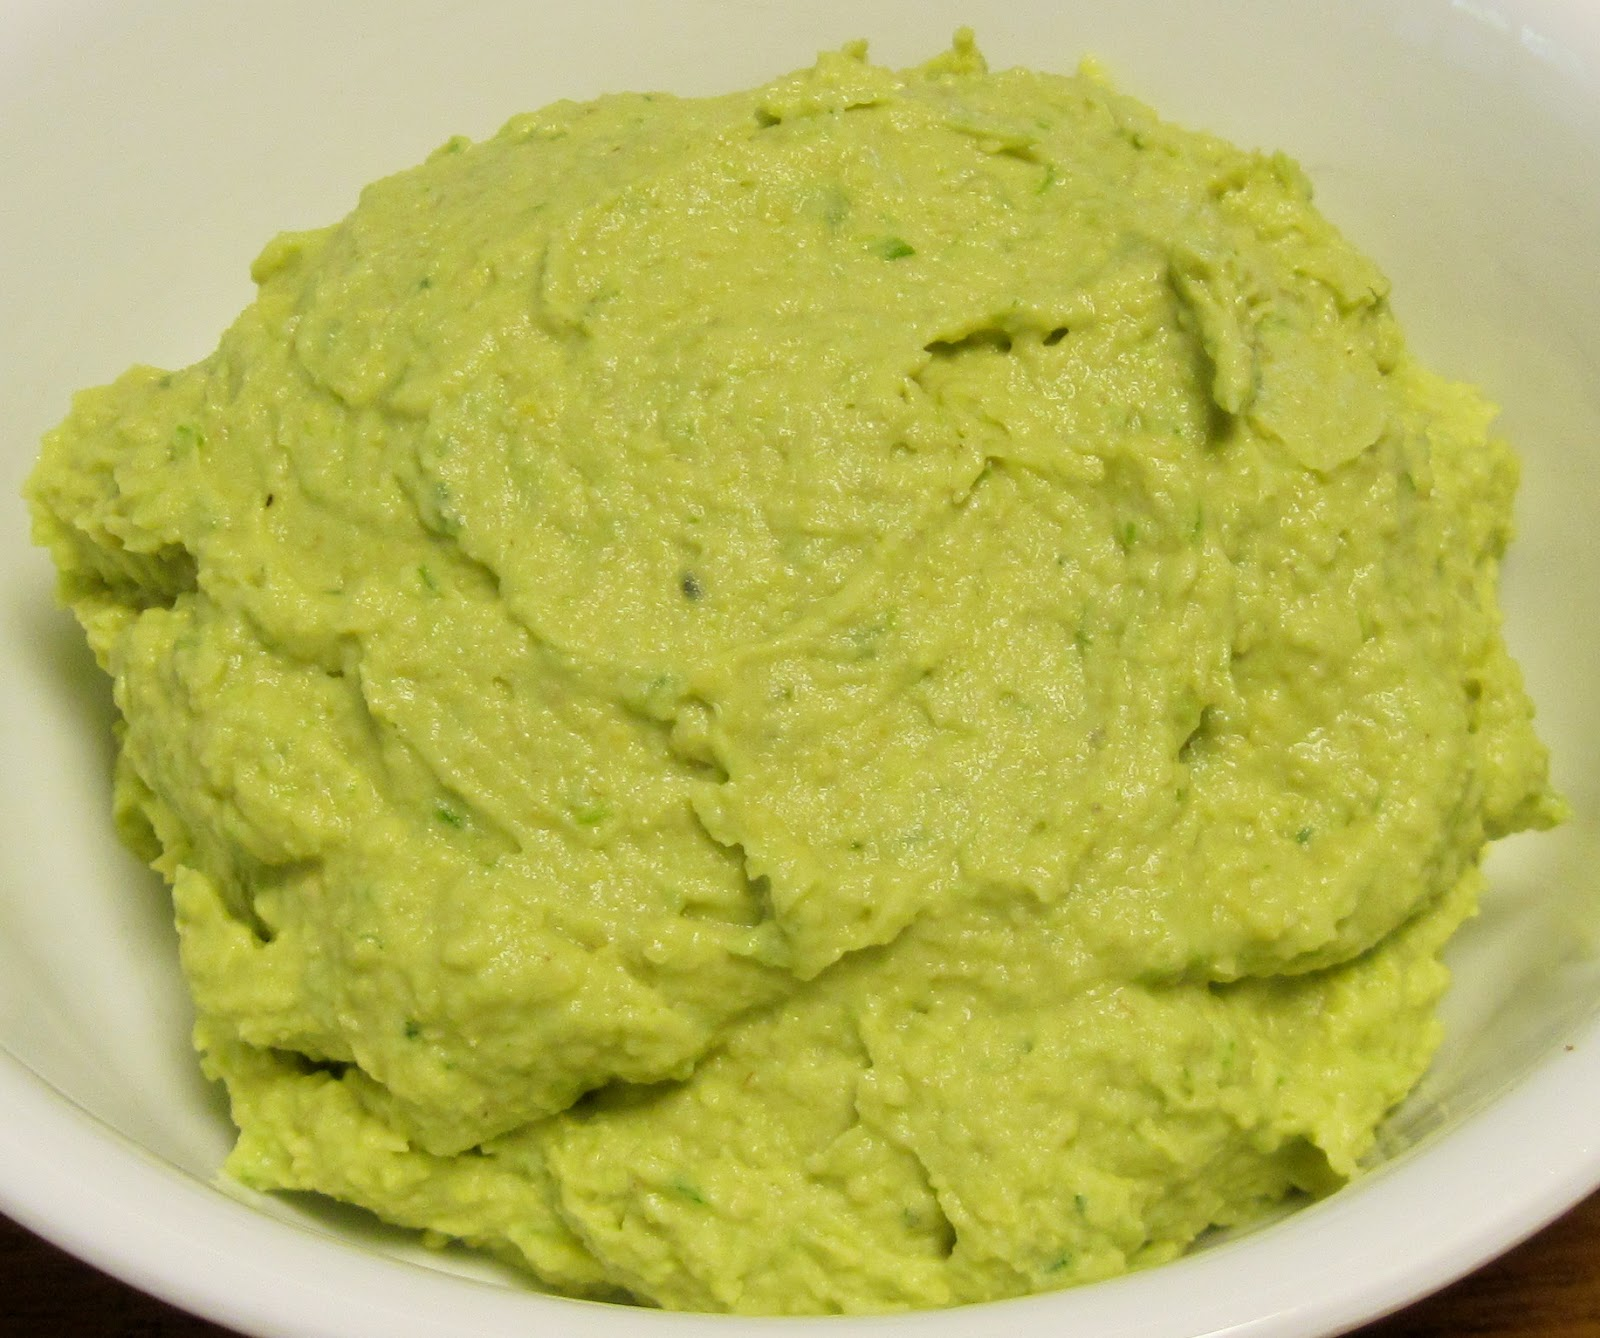 Carolina Sauce Company: Zesty Avocado-Garlic Hummus